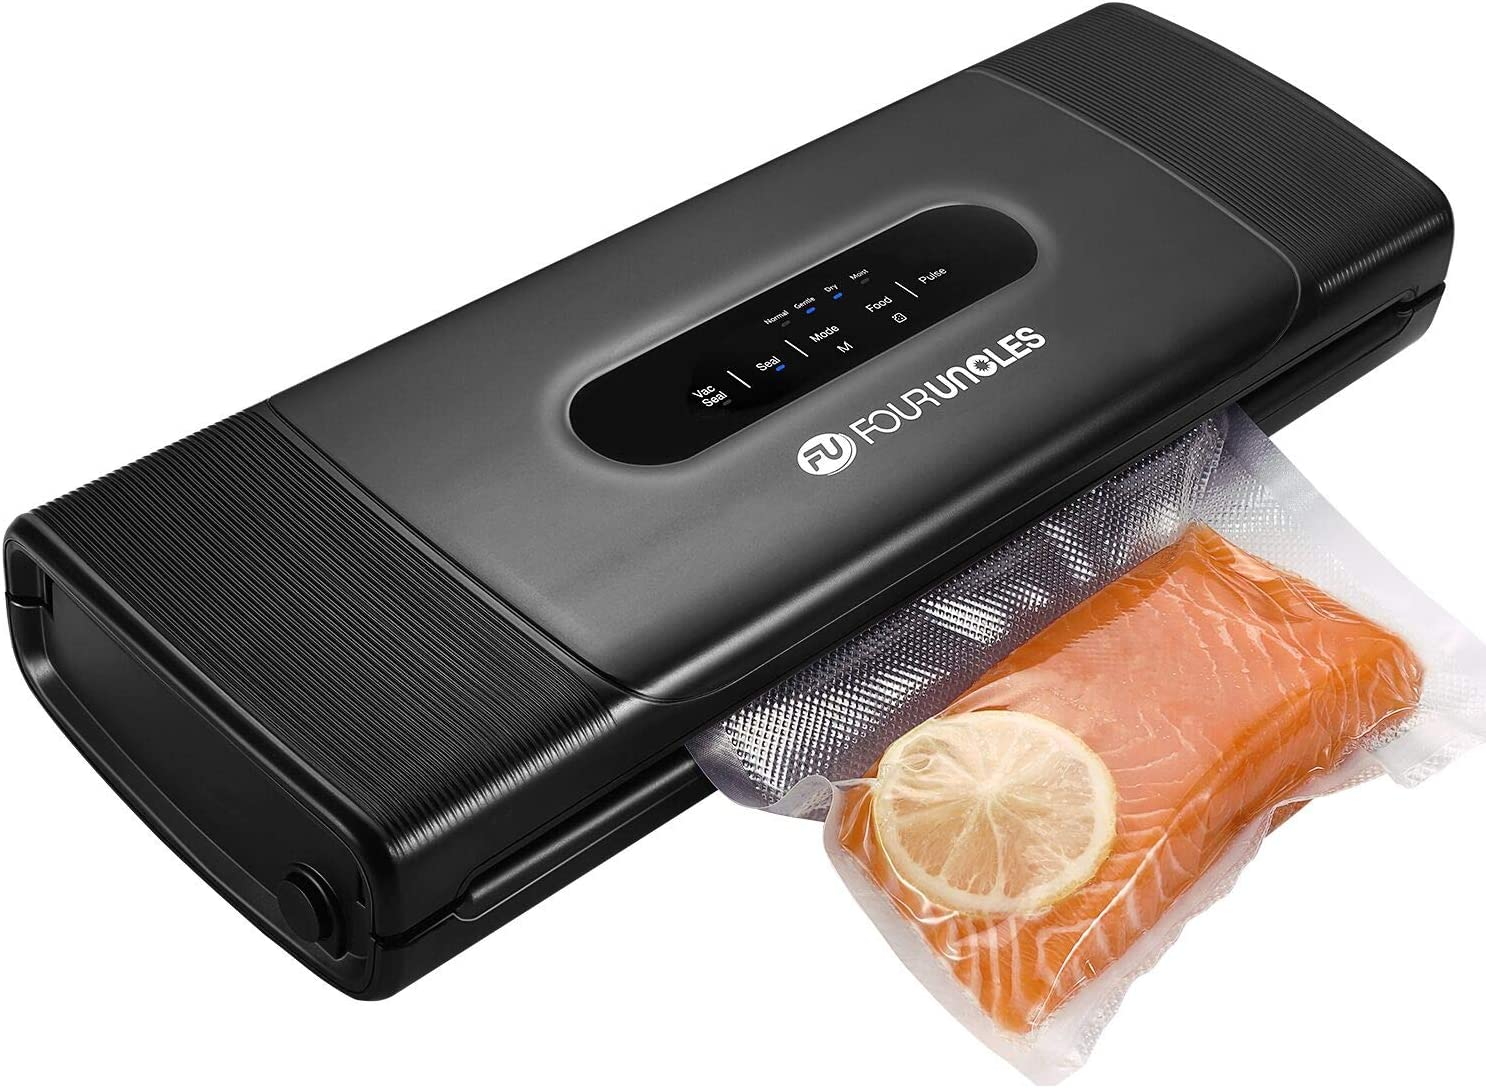 Vacuum Sealer Machine, Food Saver Vacuum Sealer Machine for Food Preservation Dry & Moist Food Modes Food Saver with Starter Kit Built-in Cutter&Marker